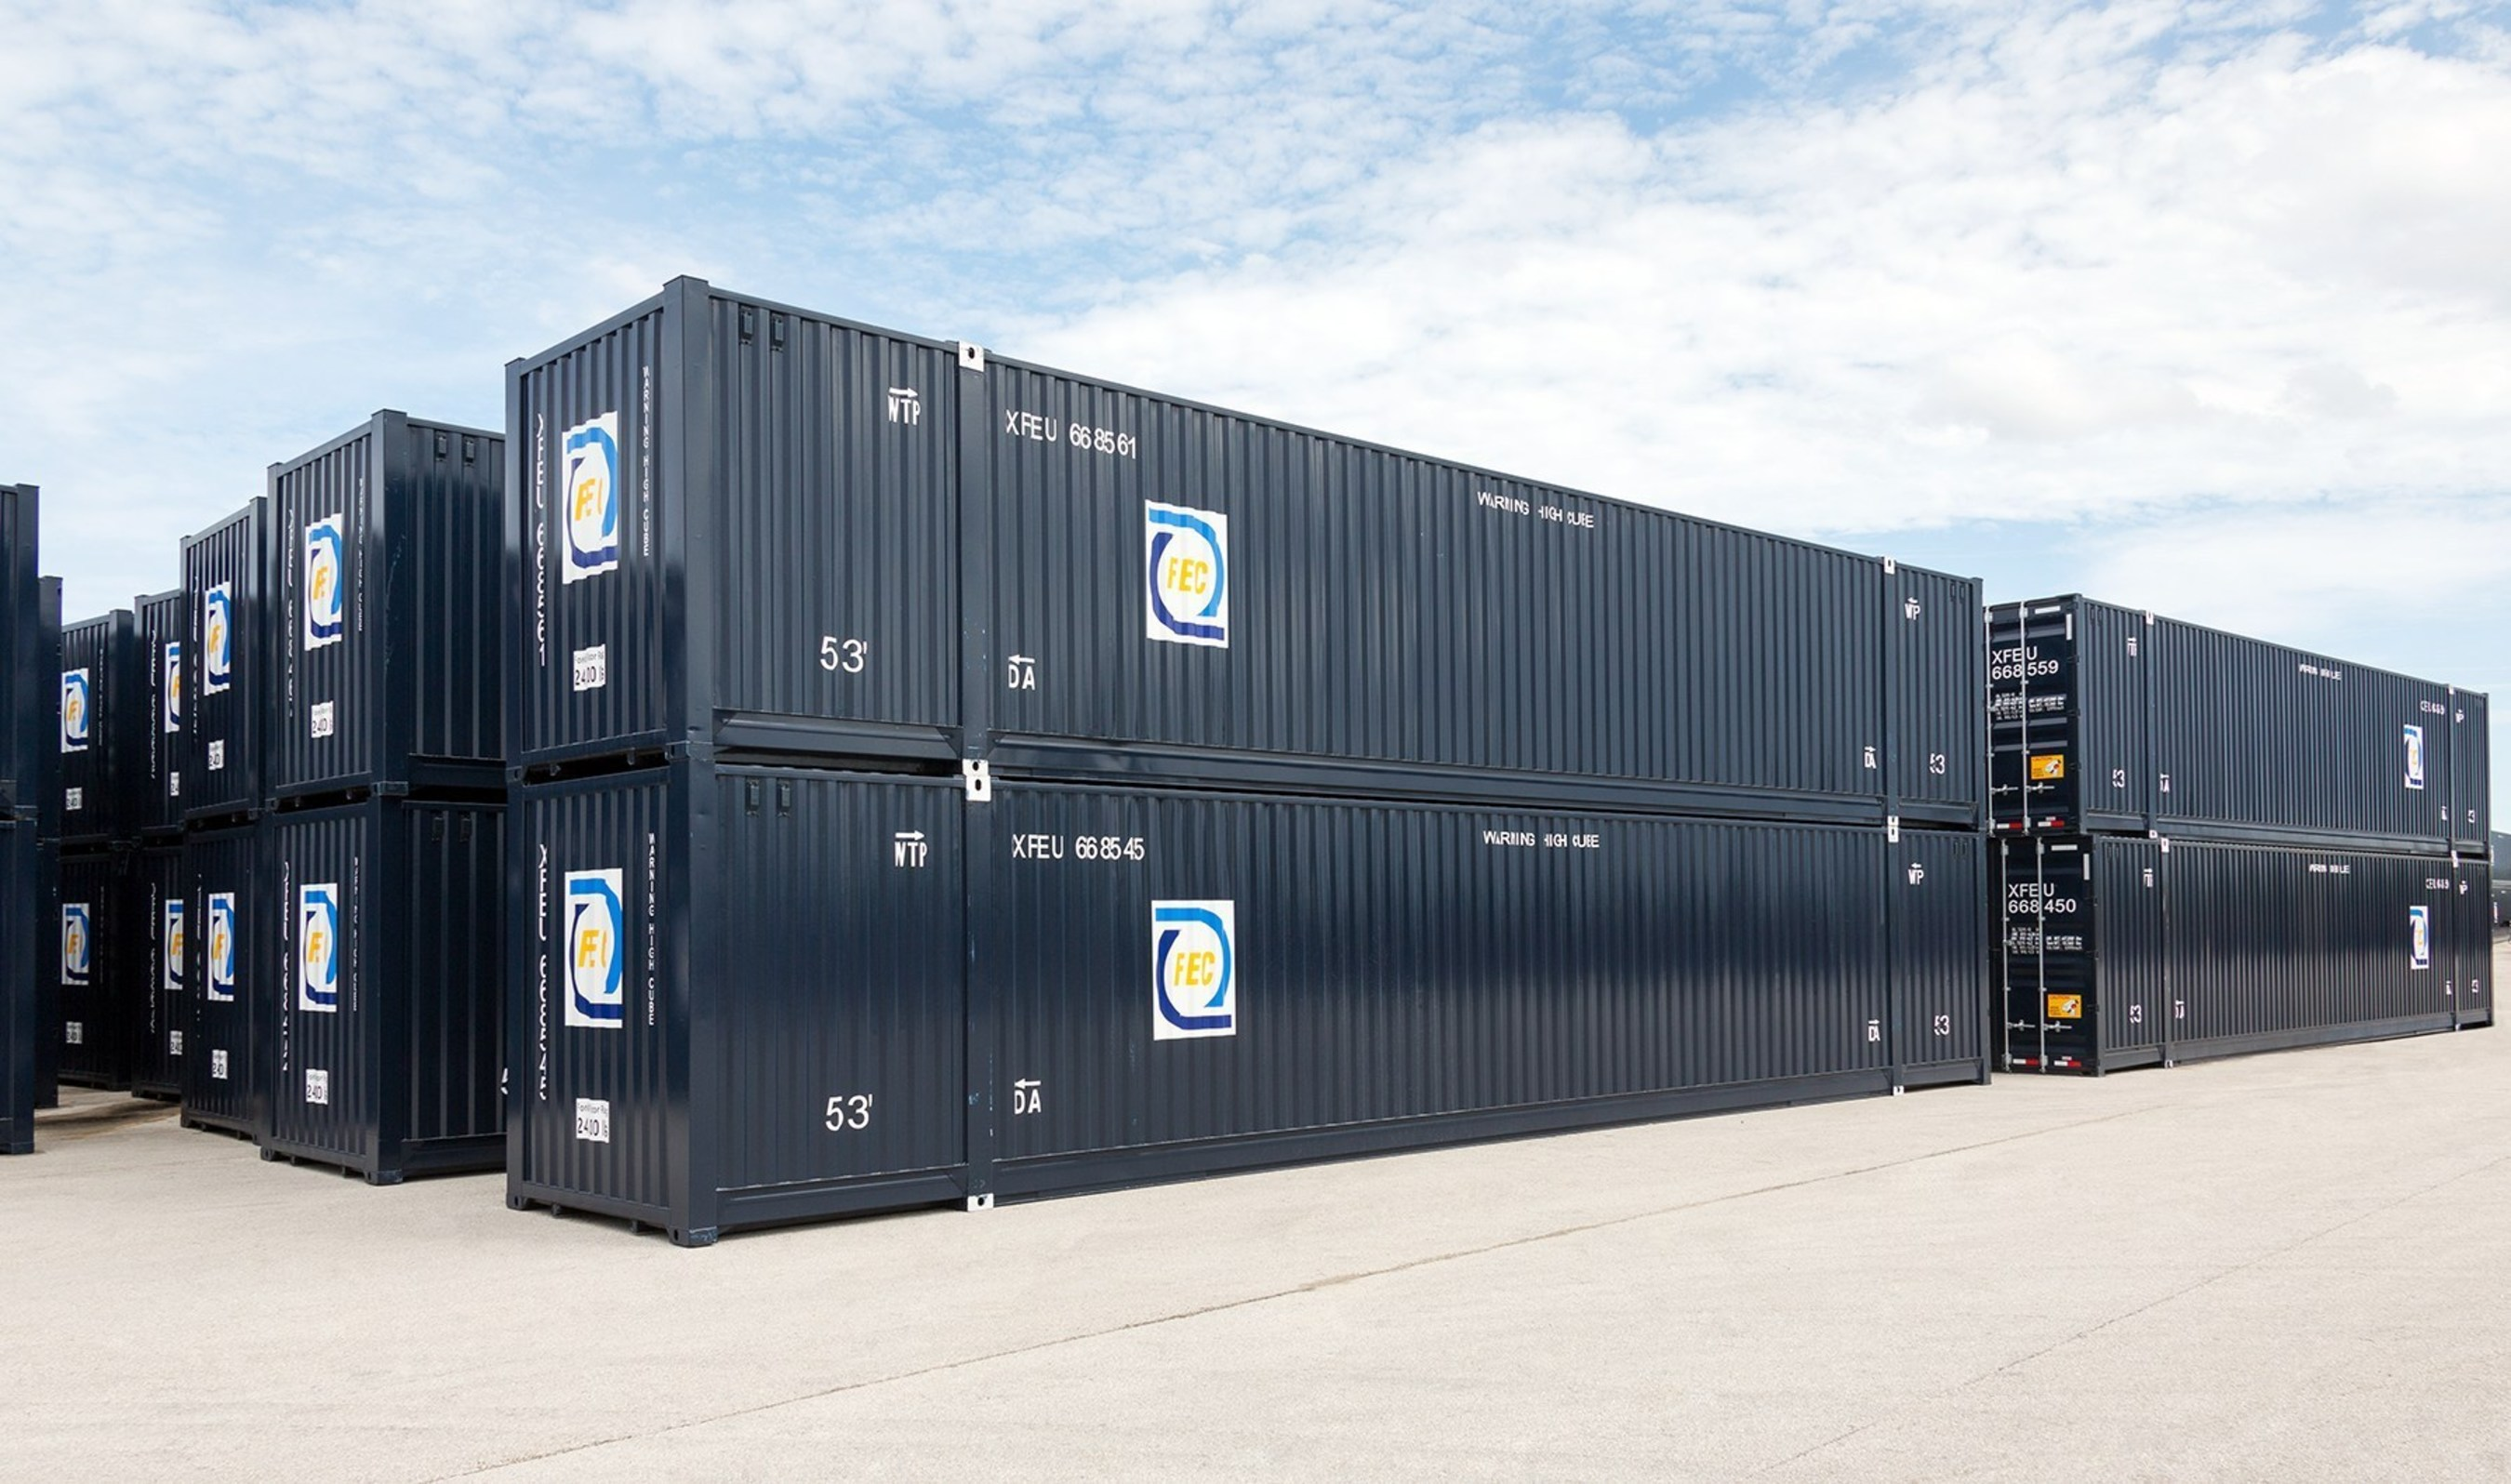 FECR has added 500 new 53' containers to its intermodal capacity. (PRNewsFoto/Florida East Coast Railway, LLC)